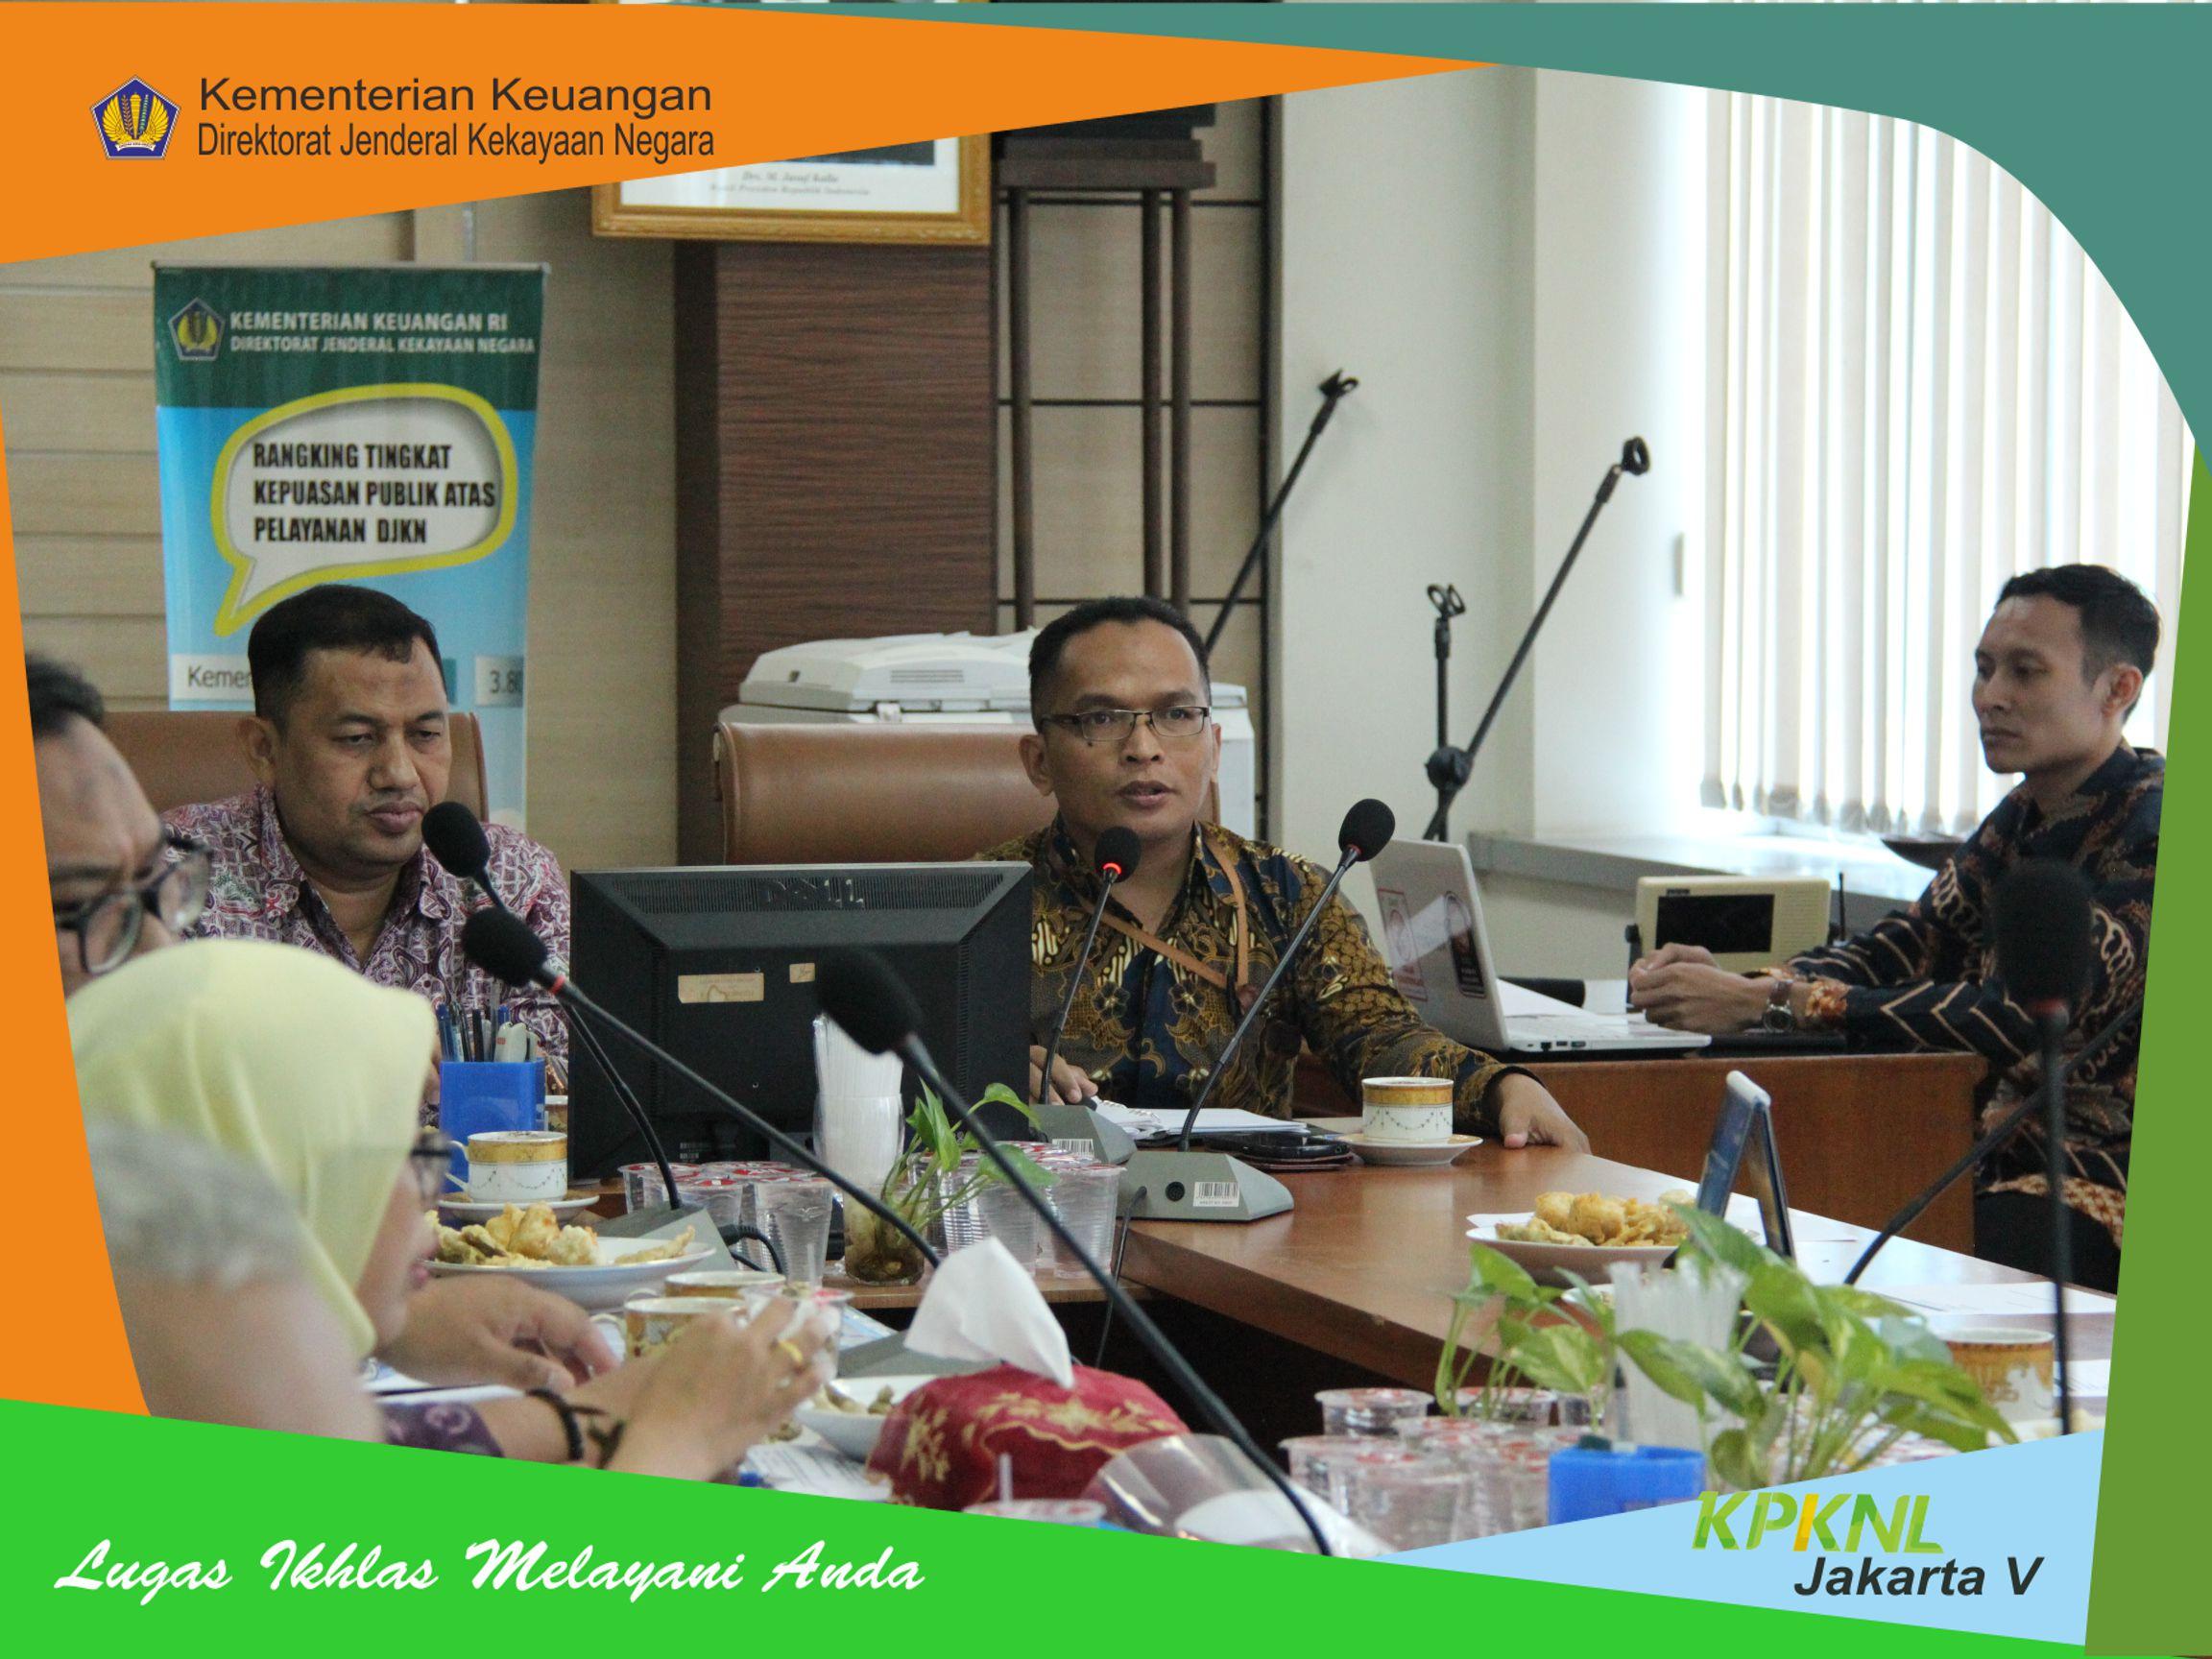 KPKNL Jakarta V Selenggarakan Dialog Kinerja Organisasi Triwulan I Tahun 2019